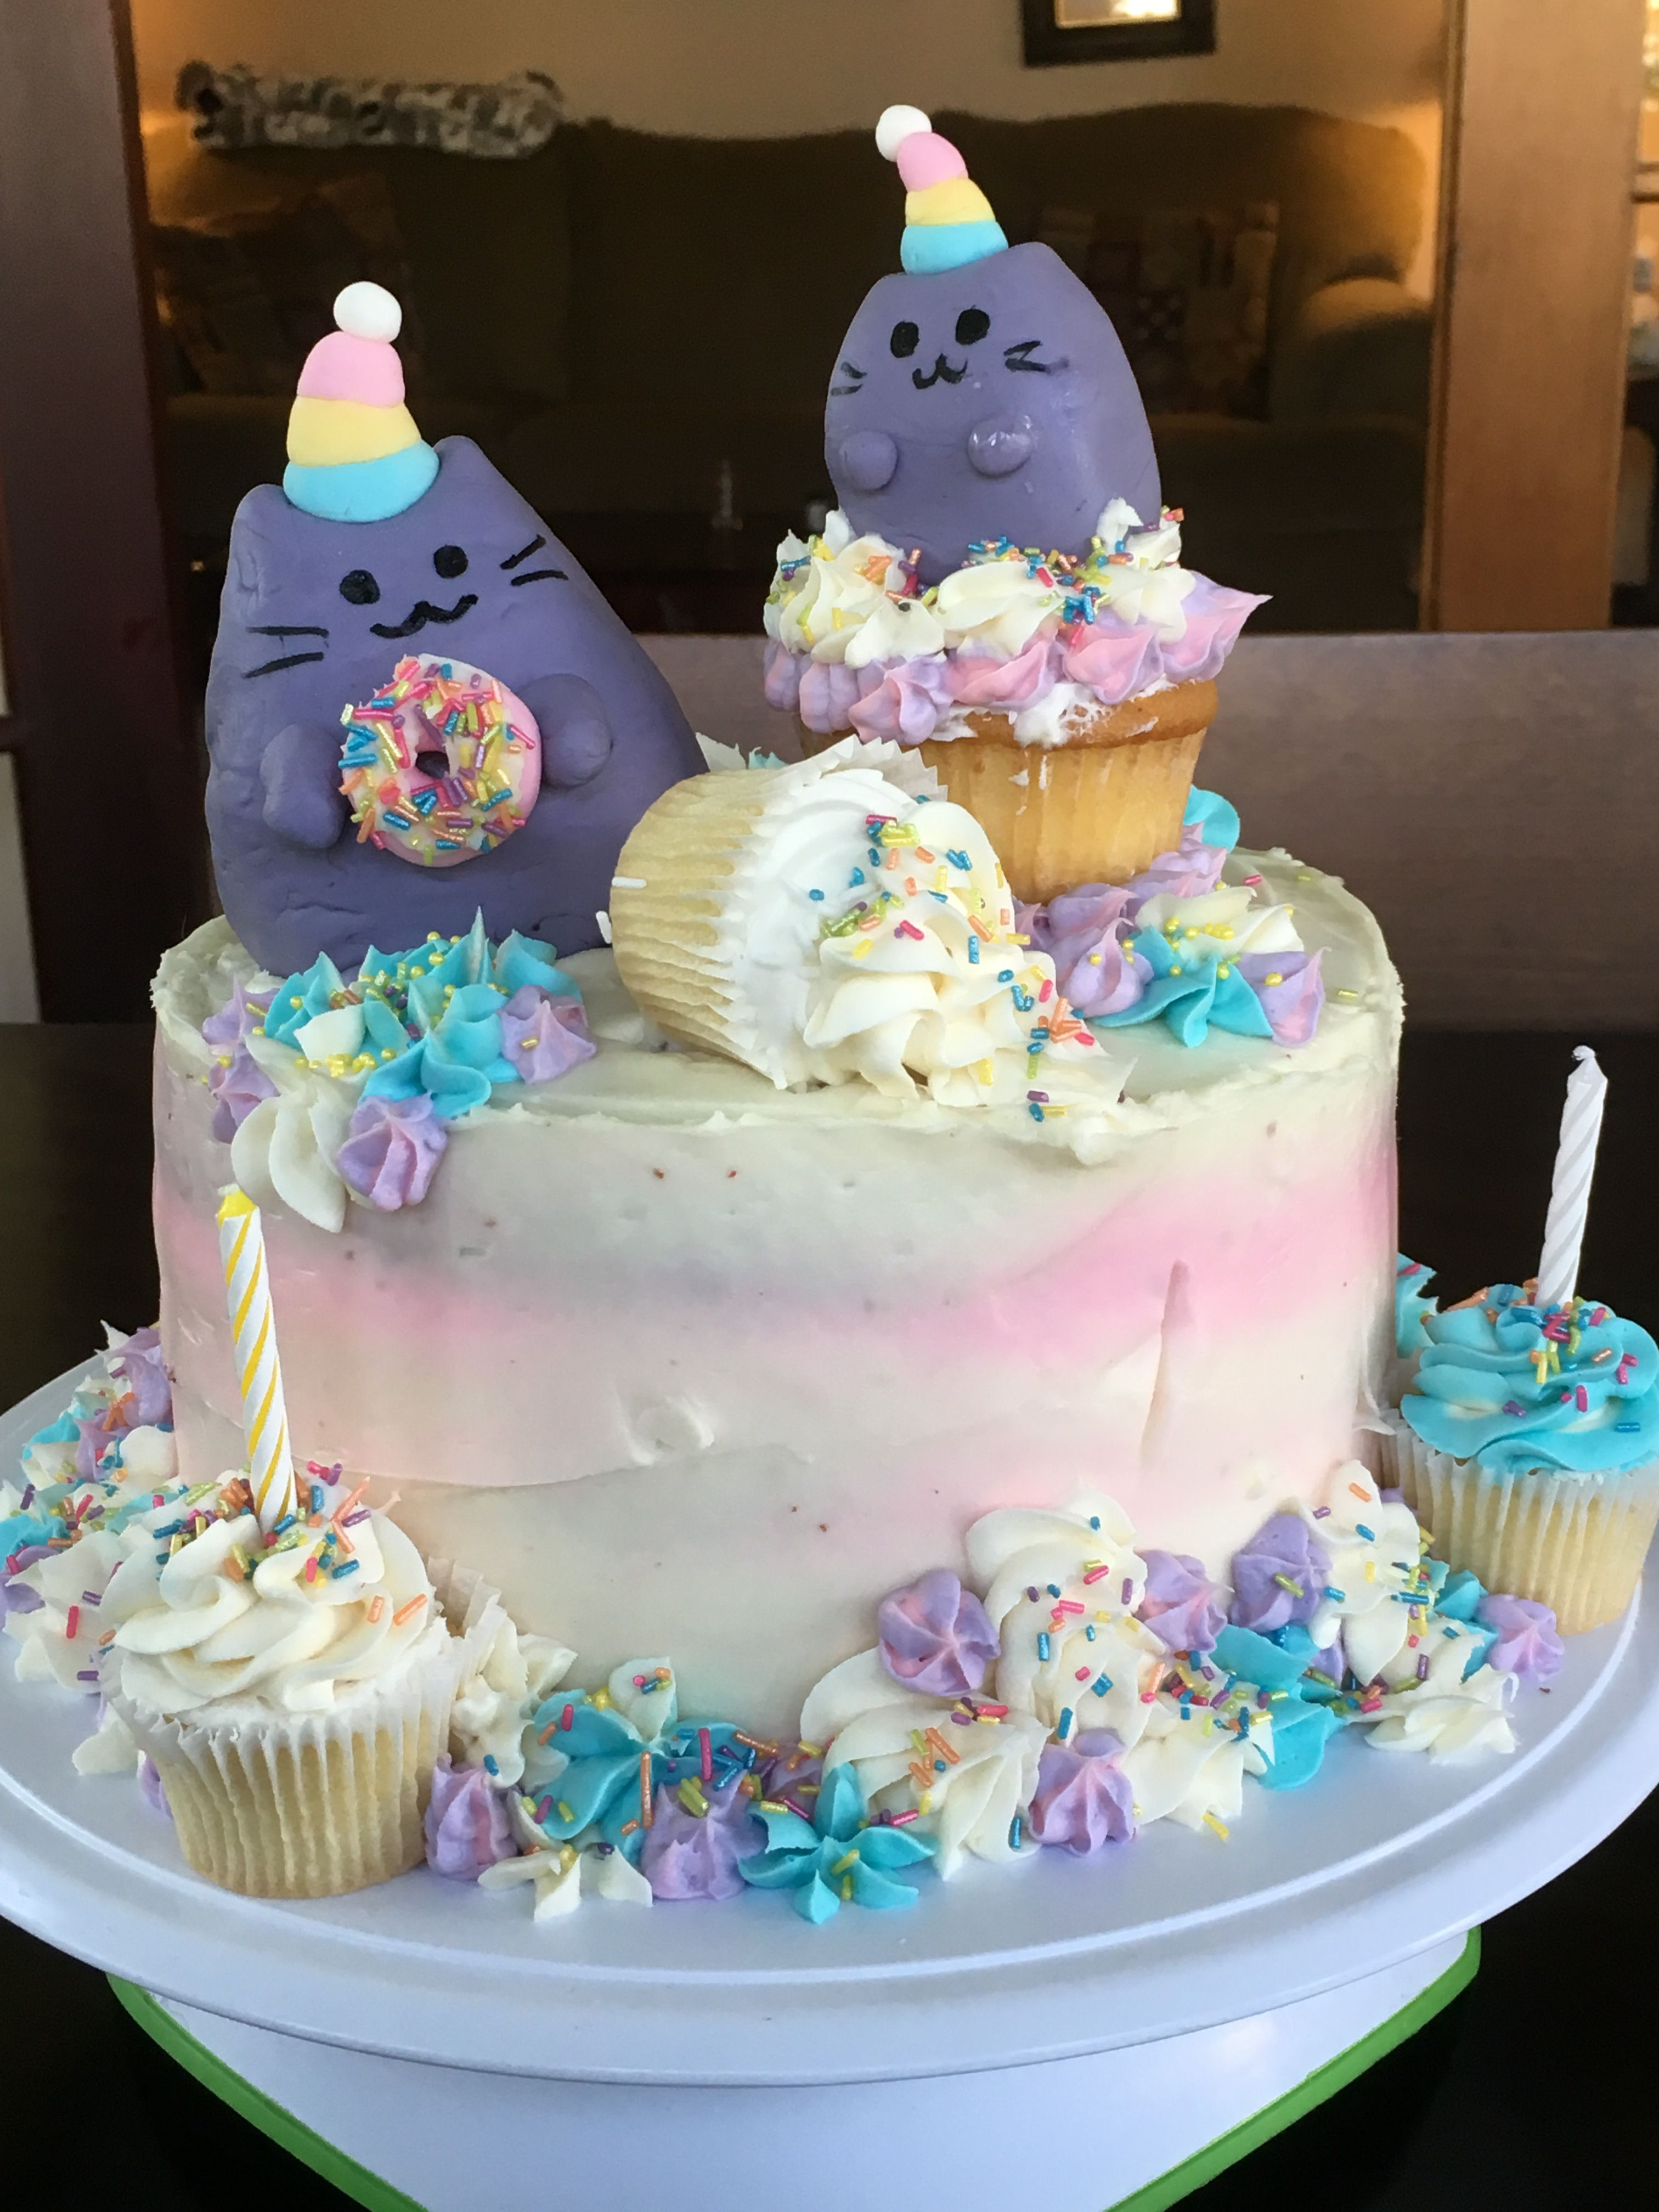 Pusheen rainbow cat cake (With images) Cake, Pusheen